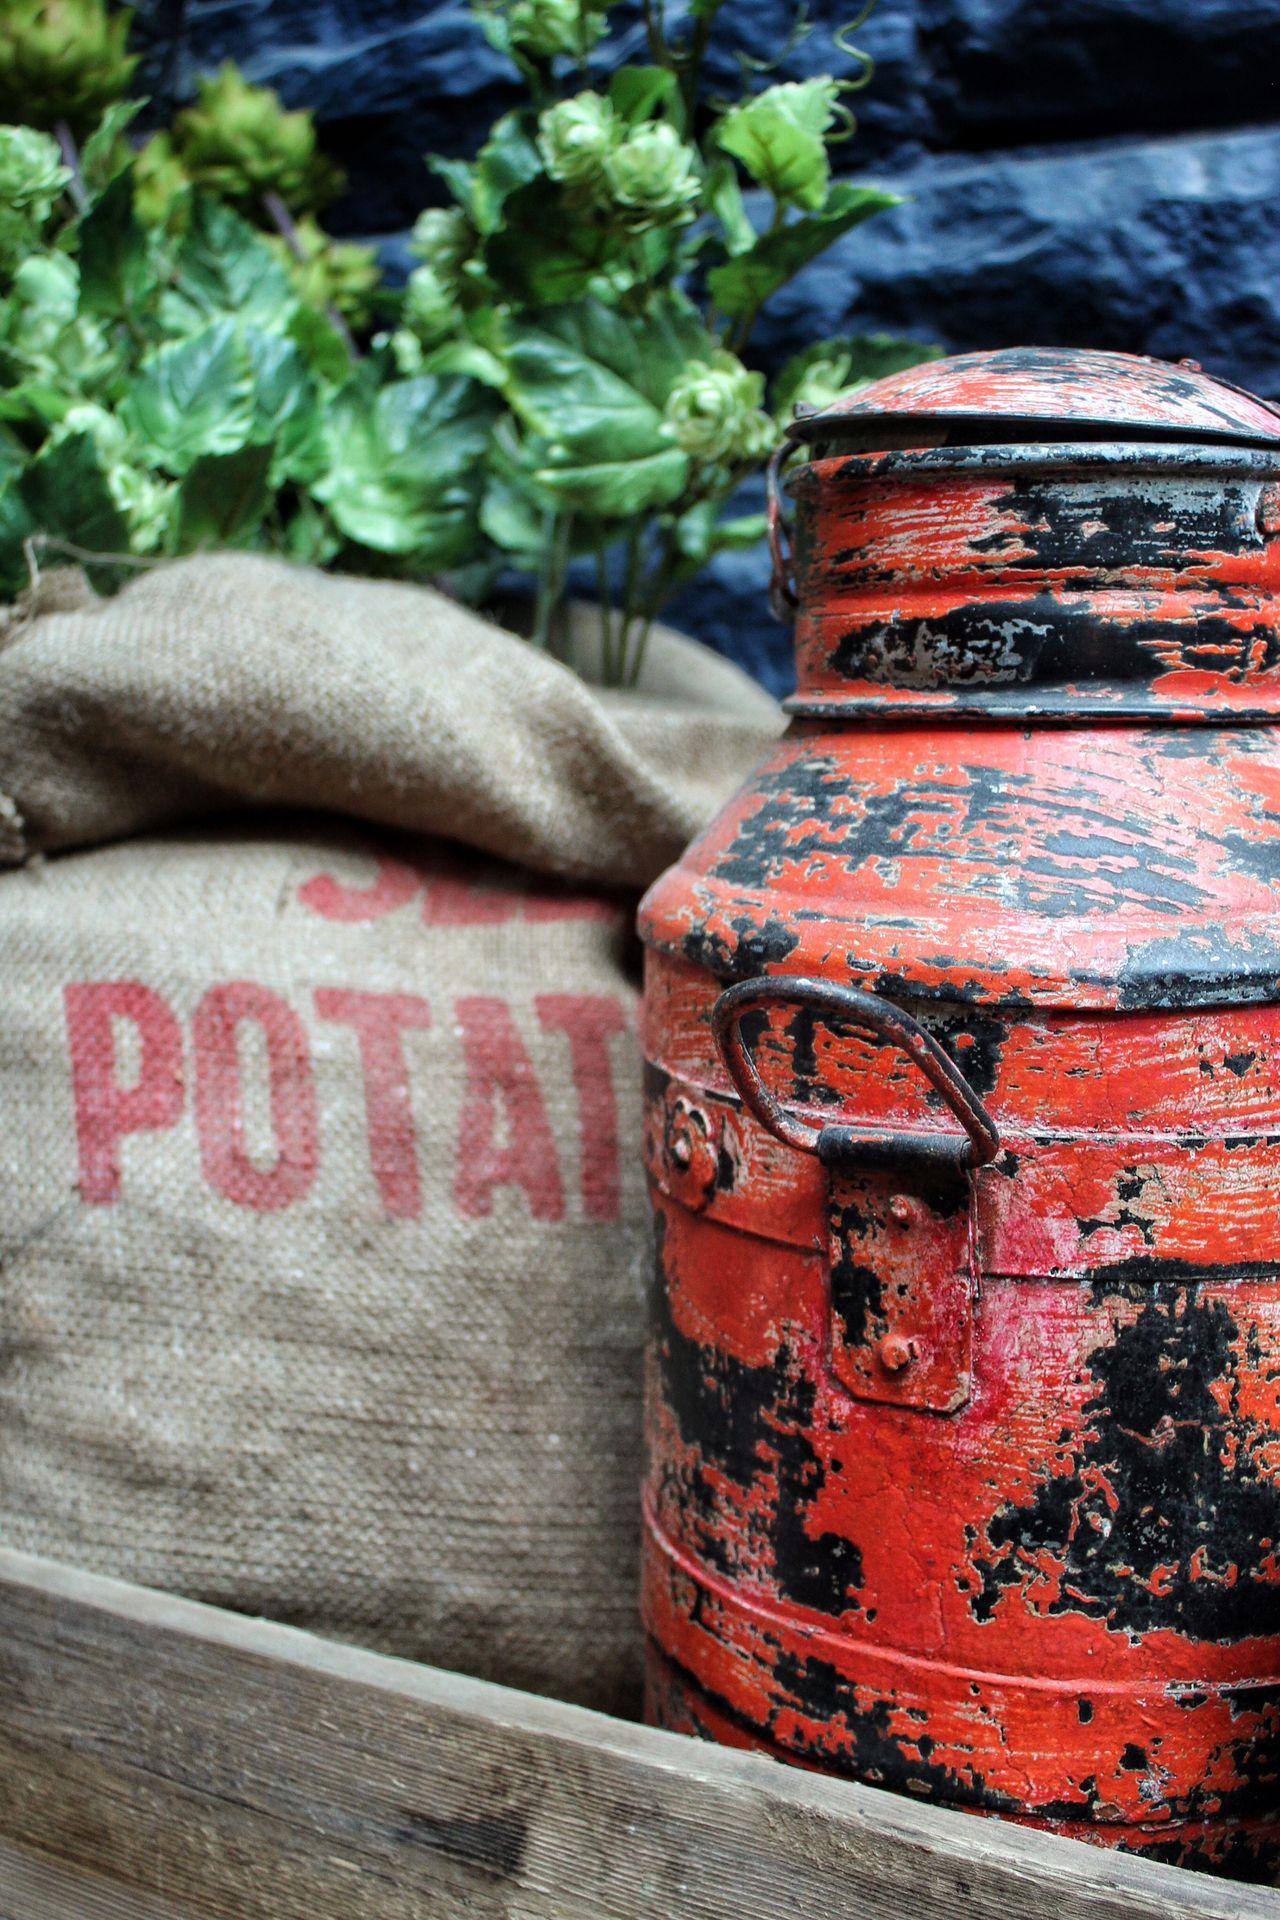 Still Life StillLifePhotography Stillife Colors Colorful Colourful Colours Red Purple Sack Potatoes Milk Milk Churn Wall Hessian Bradford Decoration Decor Fresh On Eyeem